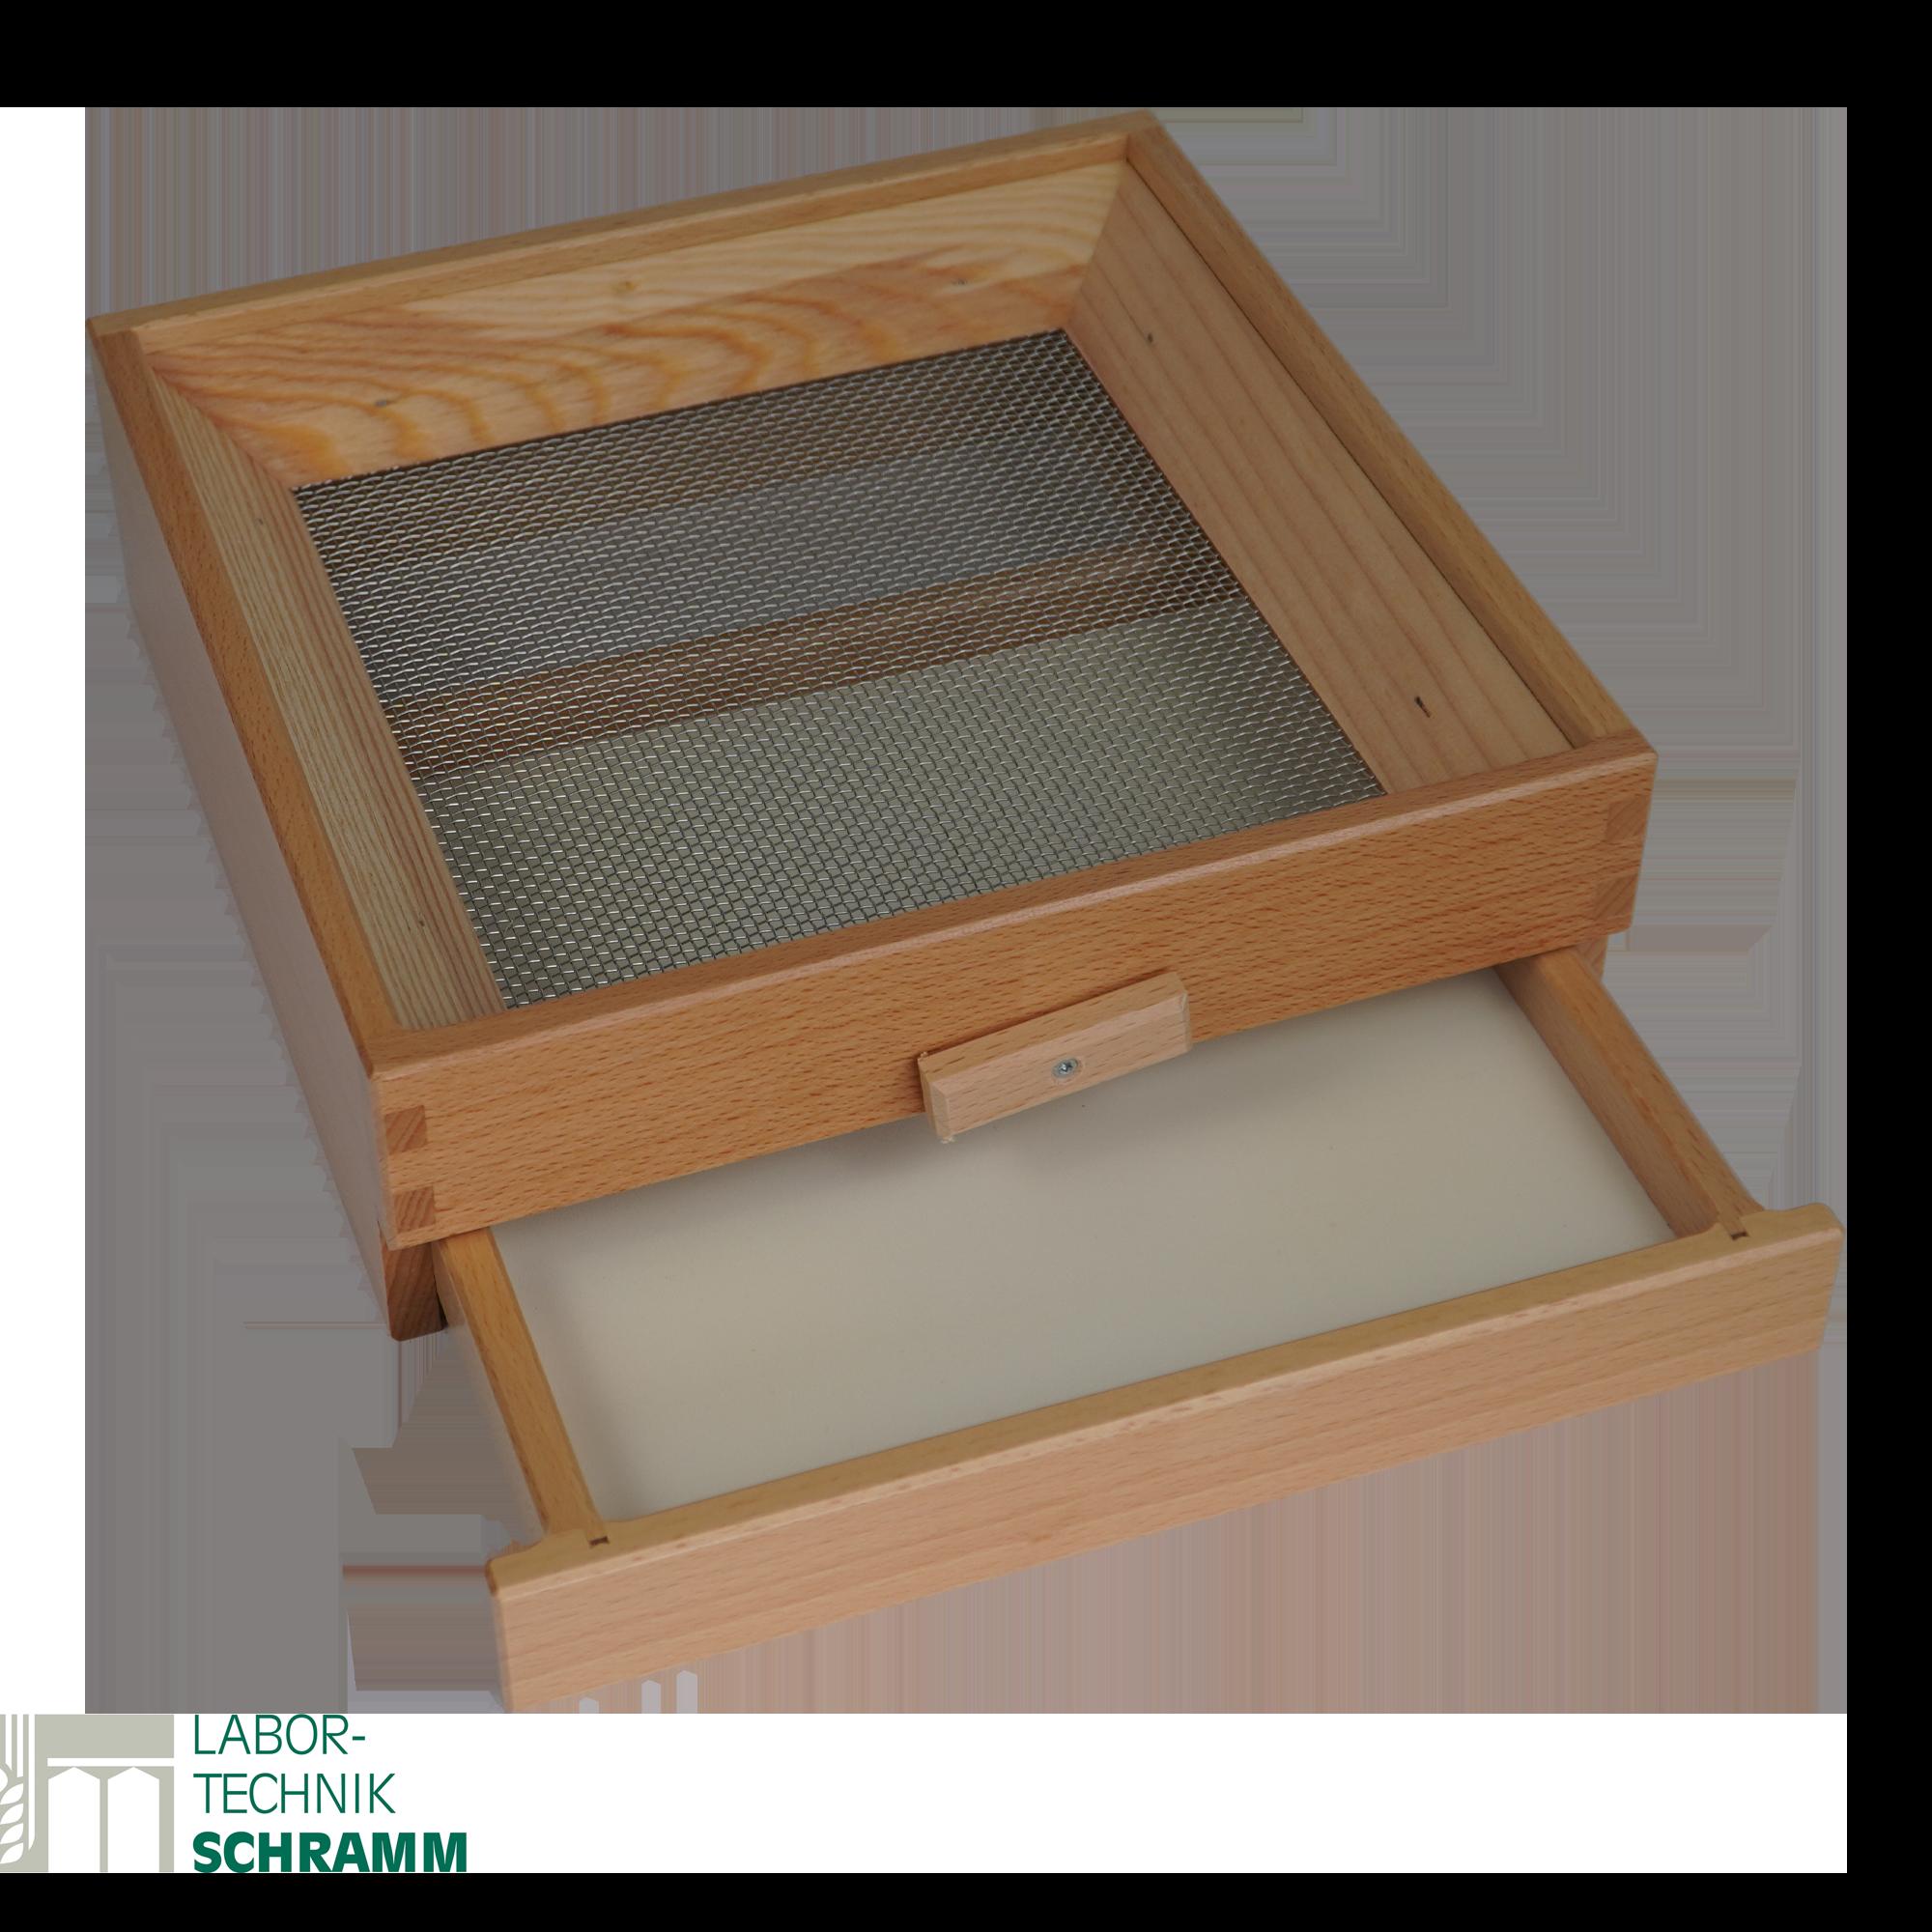 Käfersieb mit herausnehmbarer Schublade 25 x 25 cm